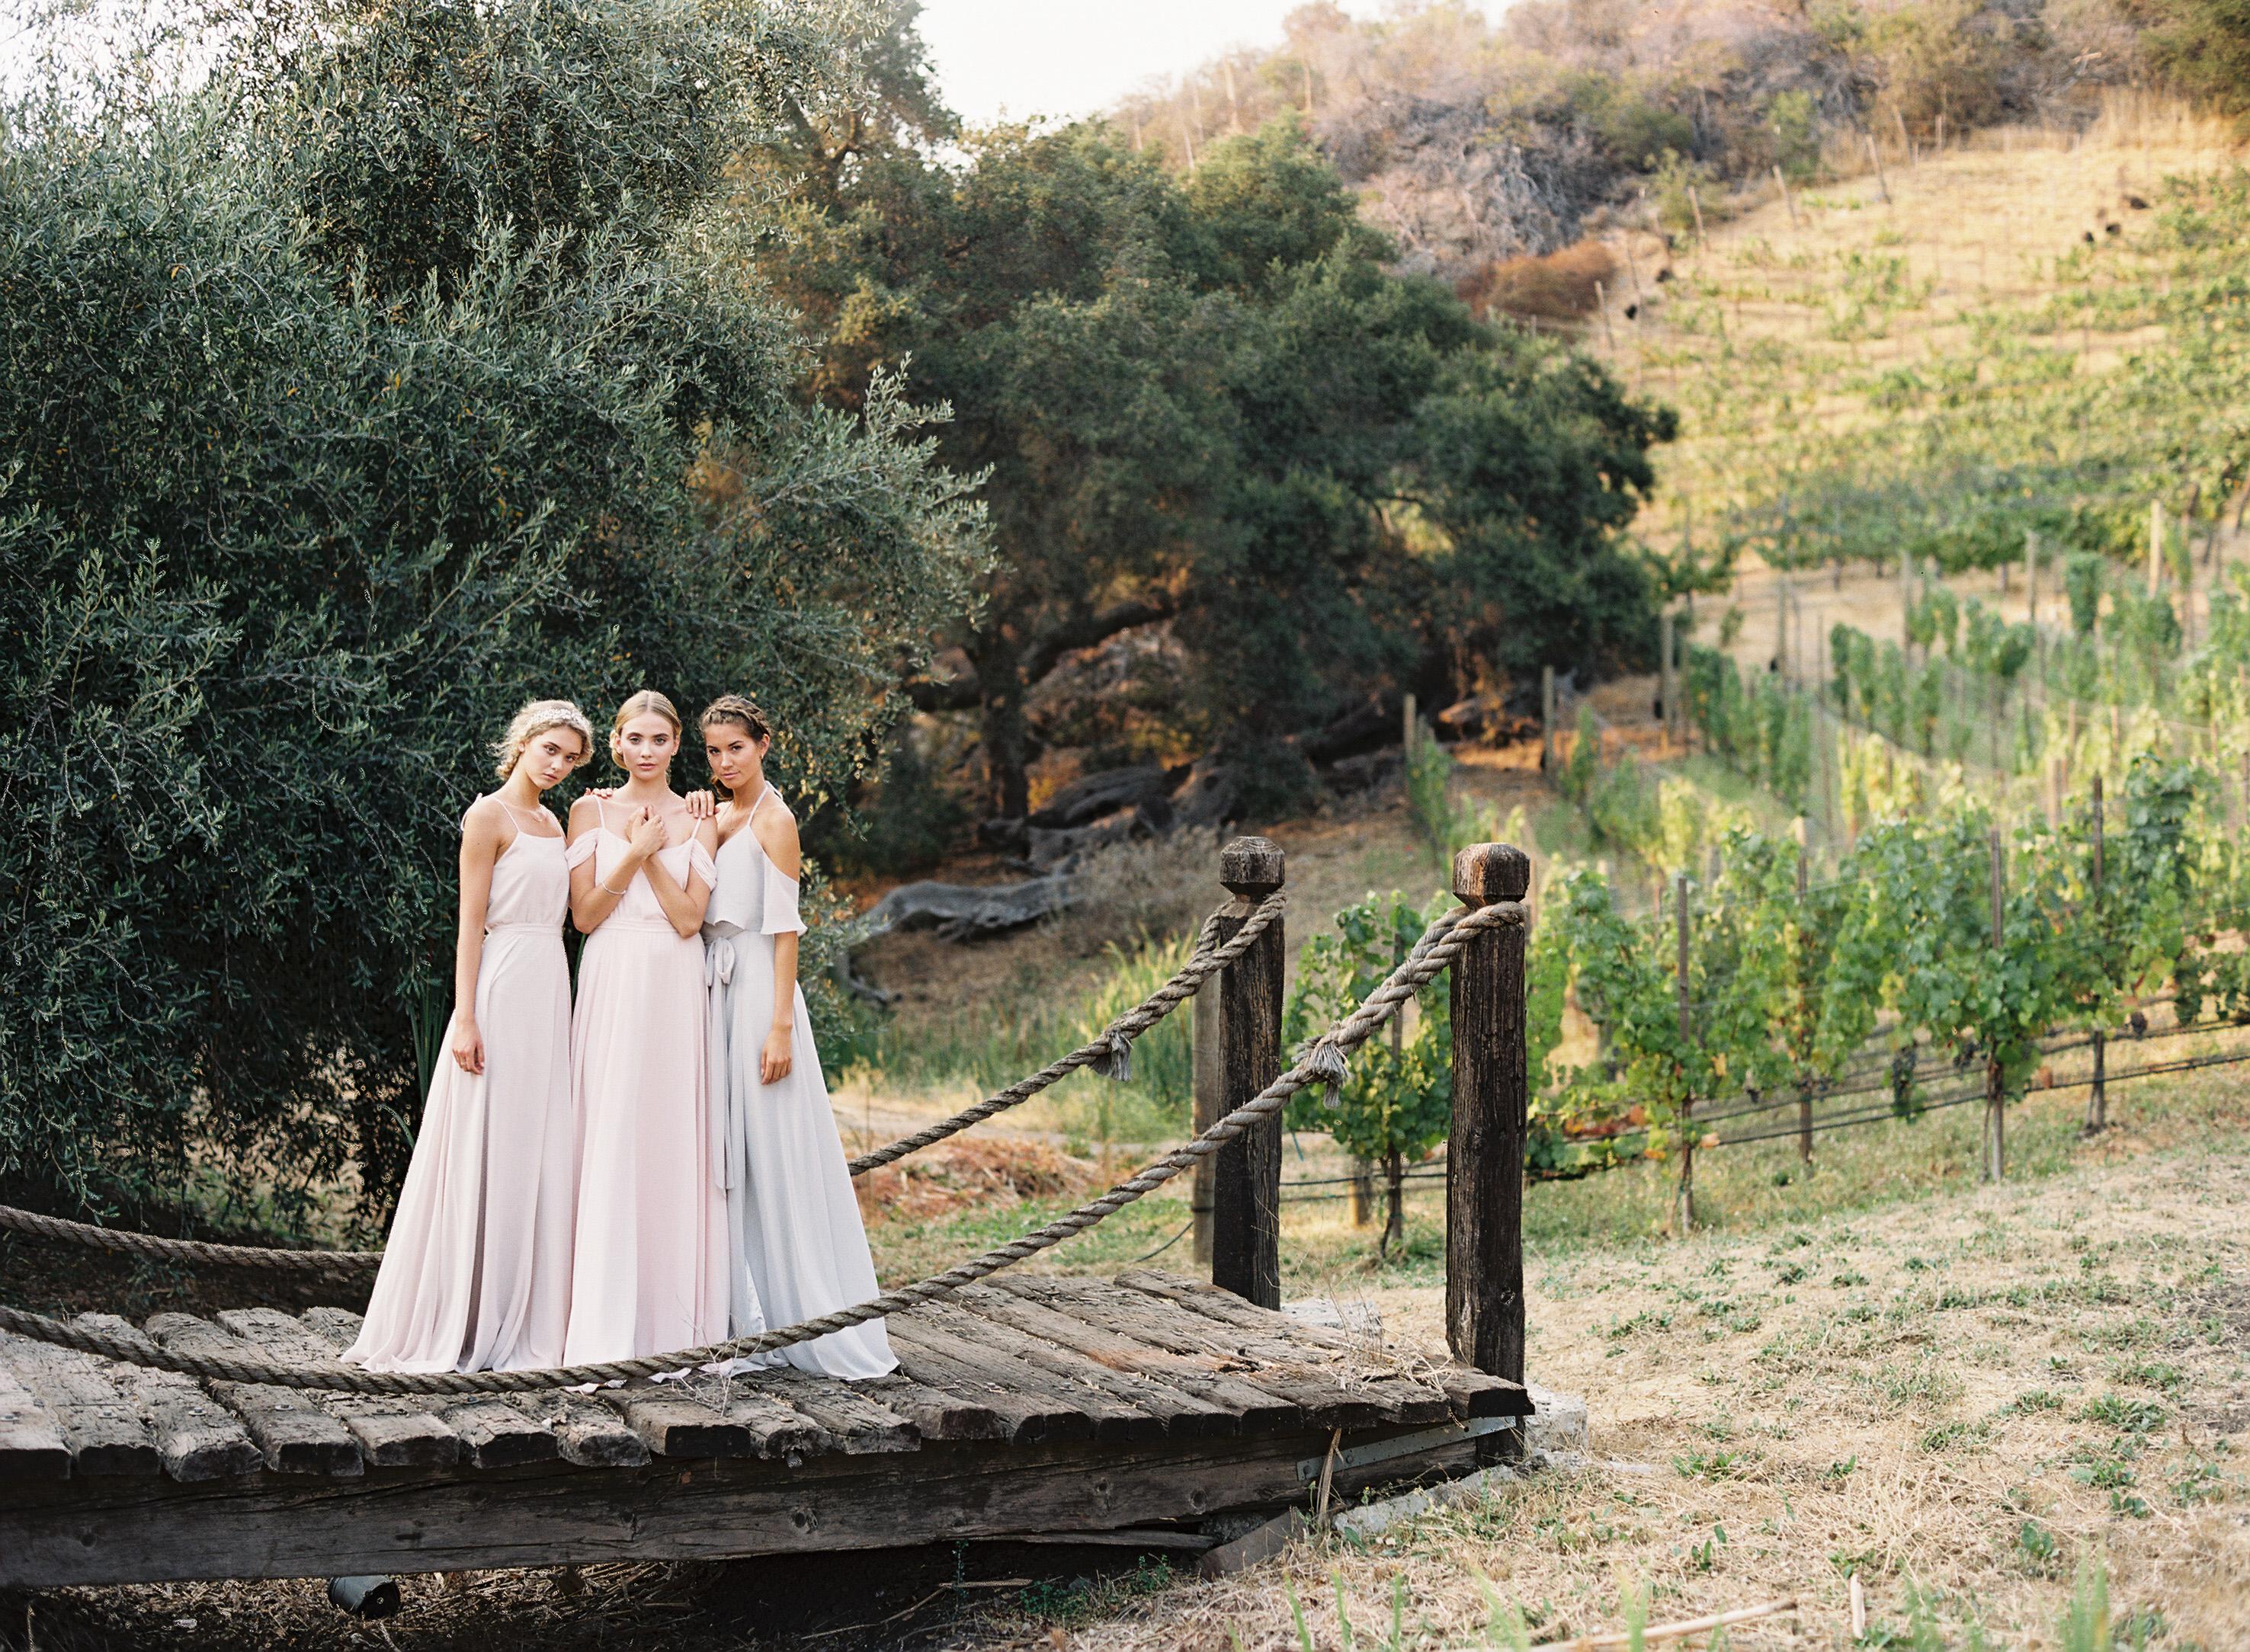 Elegant Outdoor Wedding Images - Wedding